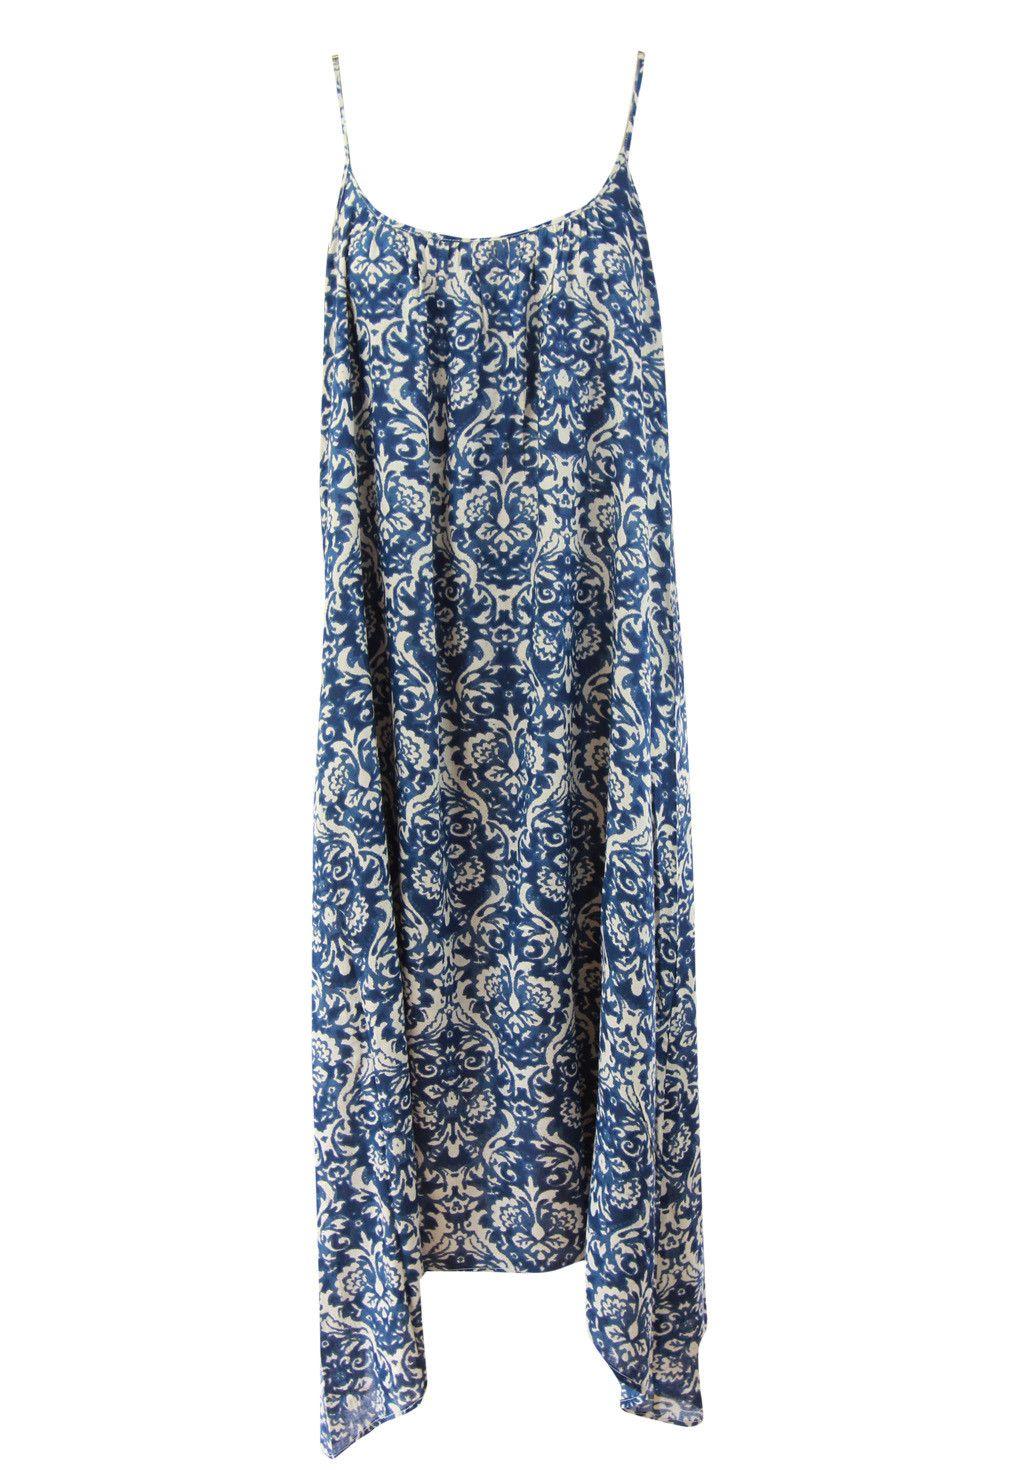 Ellis & Dewey - - Beach Print Dress